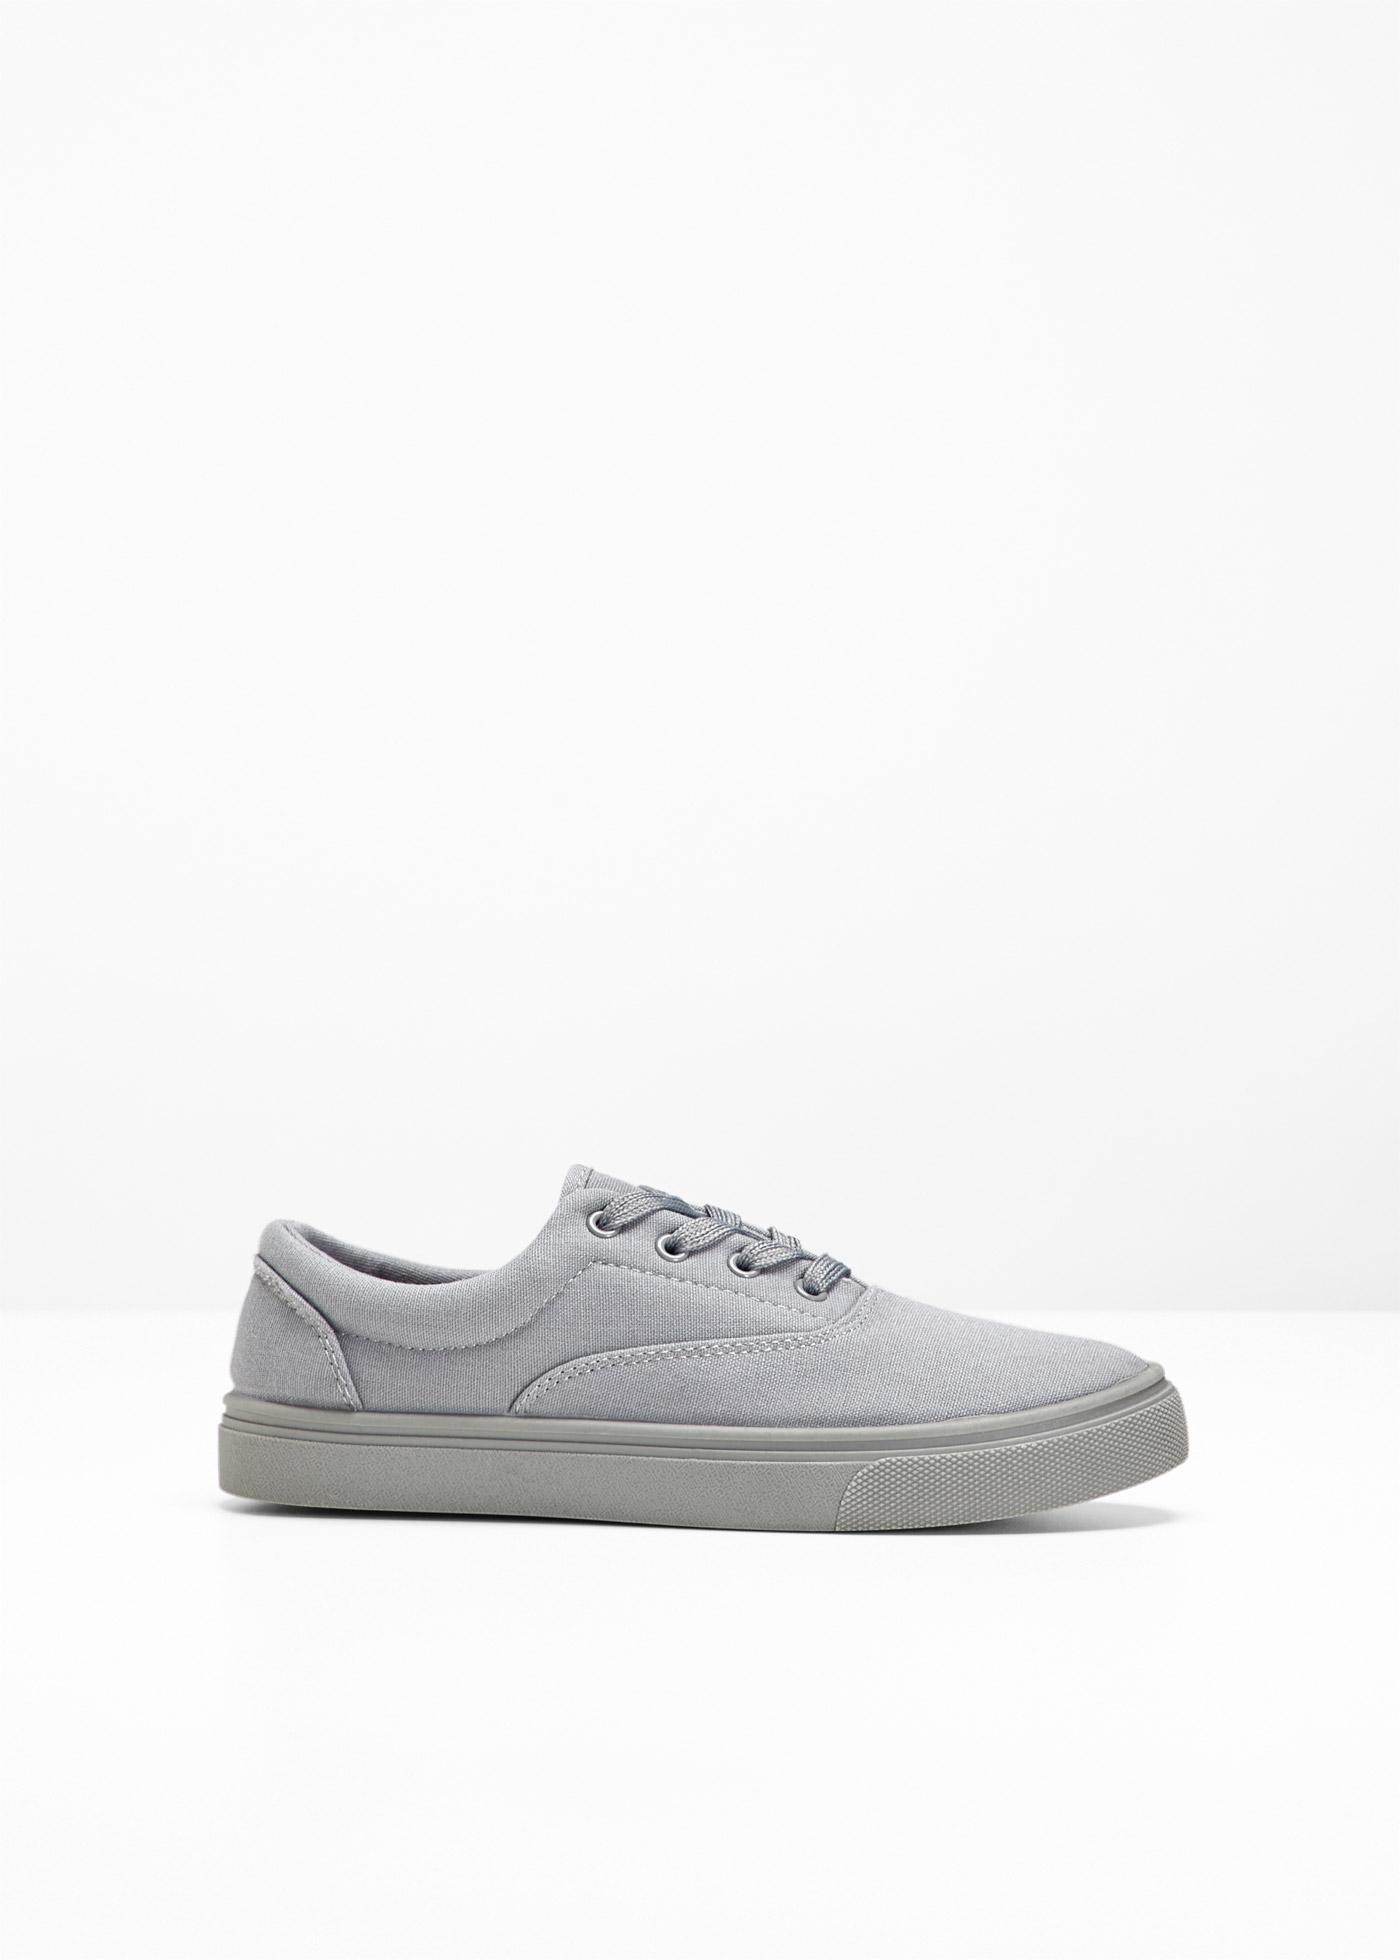 Sneaker in grau von bonprix